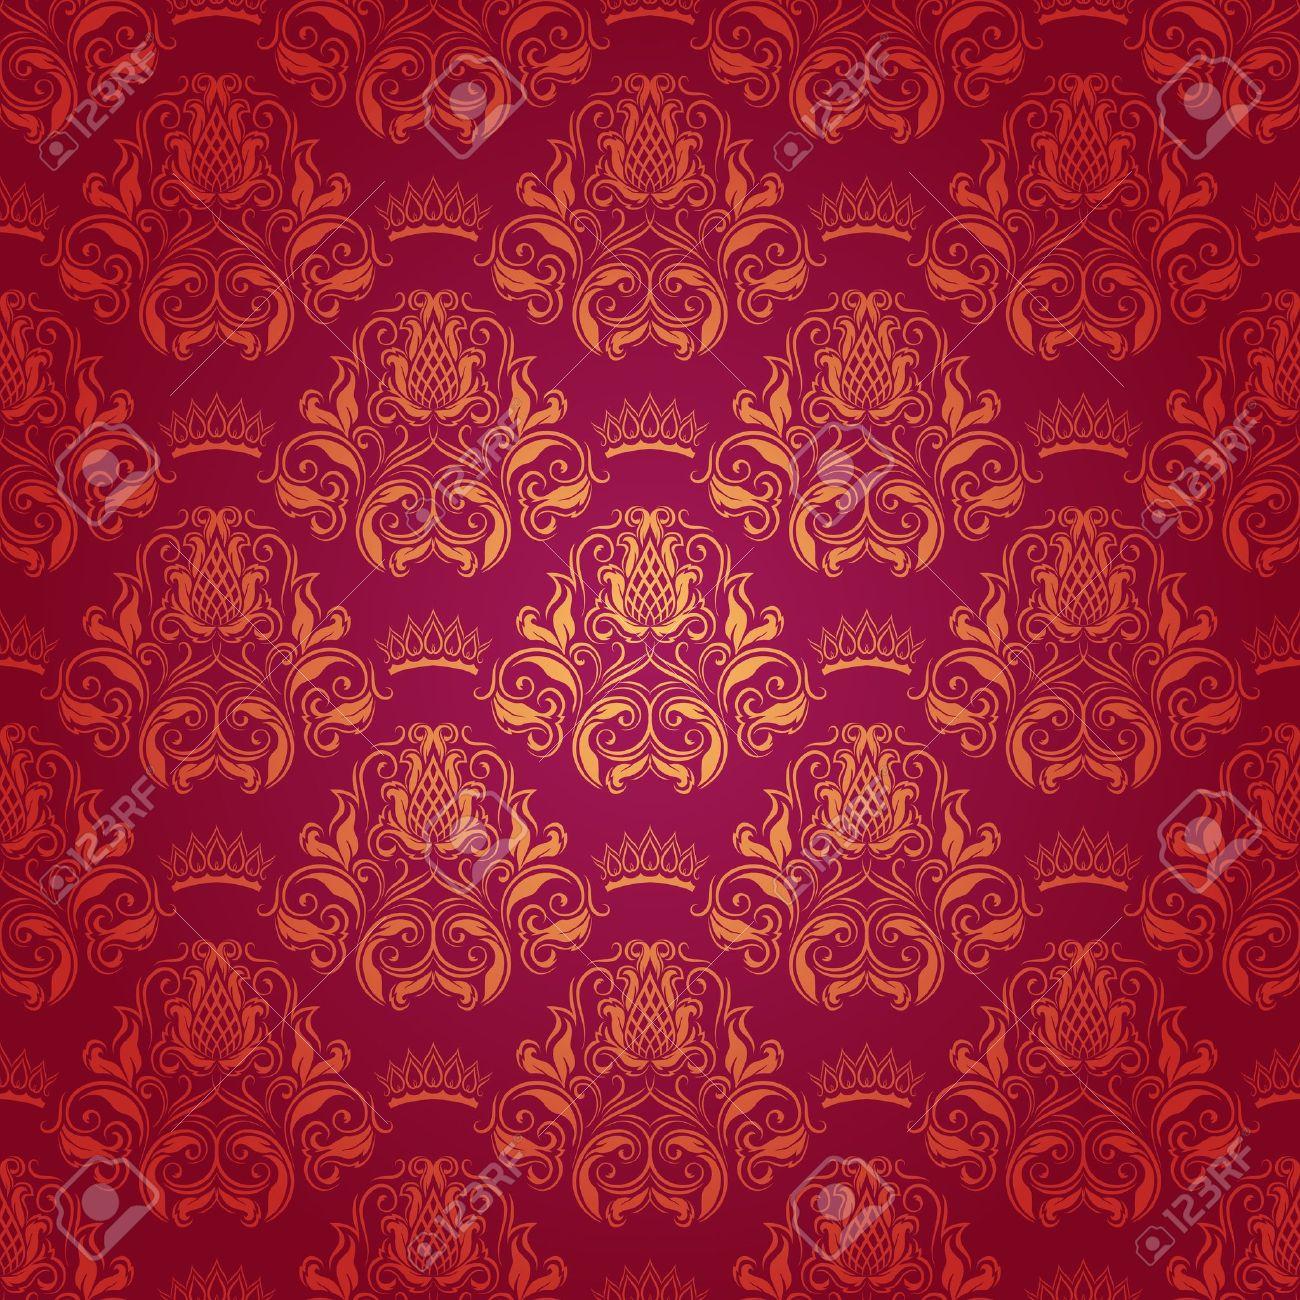 Pink Royal Background Hd